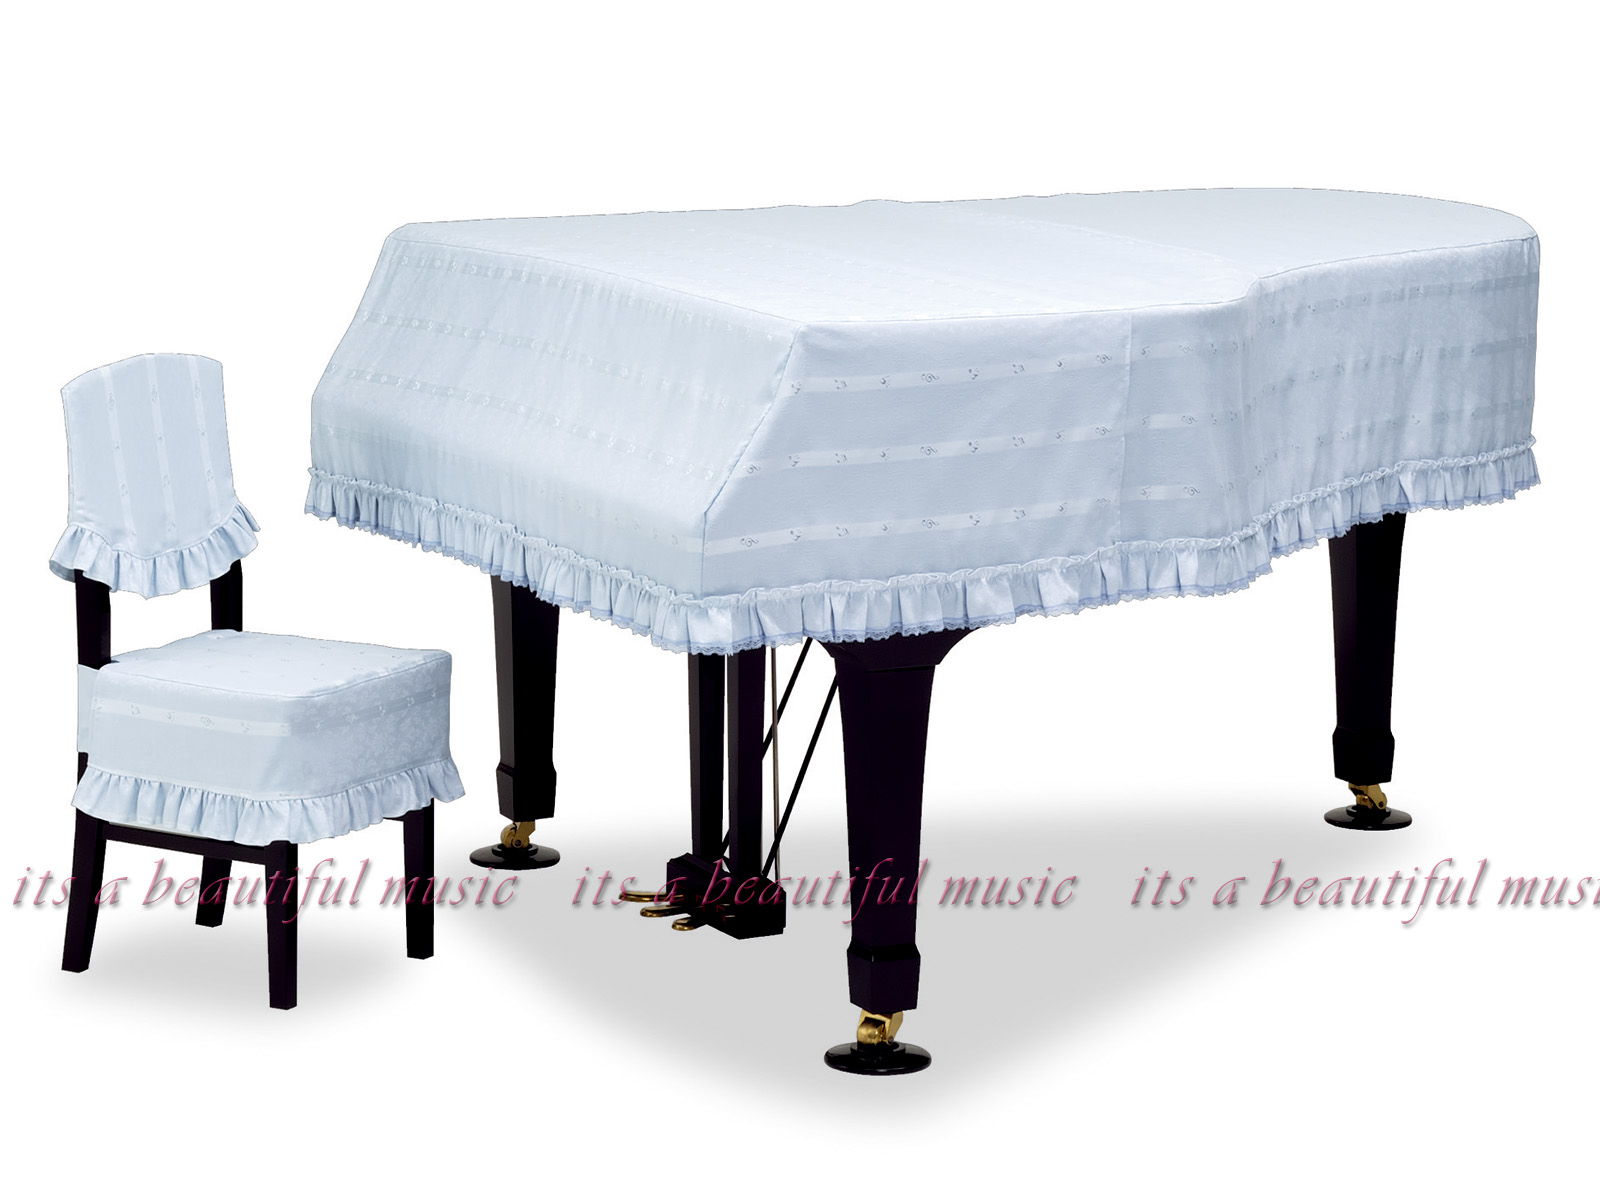 【its】レビューでもれなく高級クロス同梱!グランドピアノカバー 吉澤GP-579SB「清涼感あるブルーに音符柄ストライプ」【奥行150~160cm未満/A1/GB1K/GM12/G-156等】(ヨシザワ579SBシリーズ)